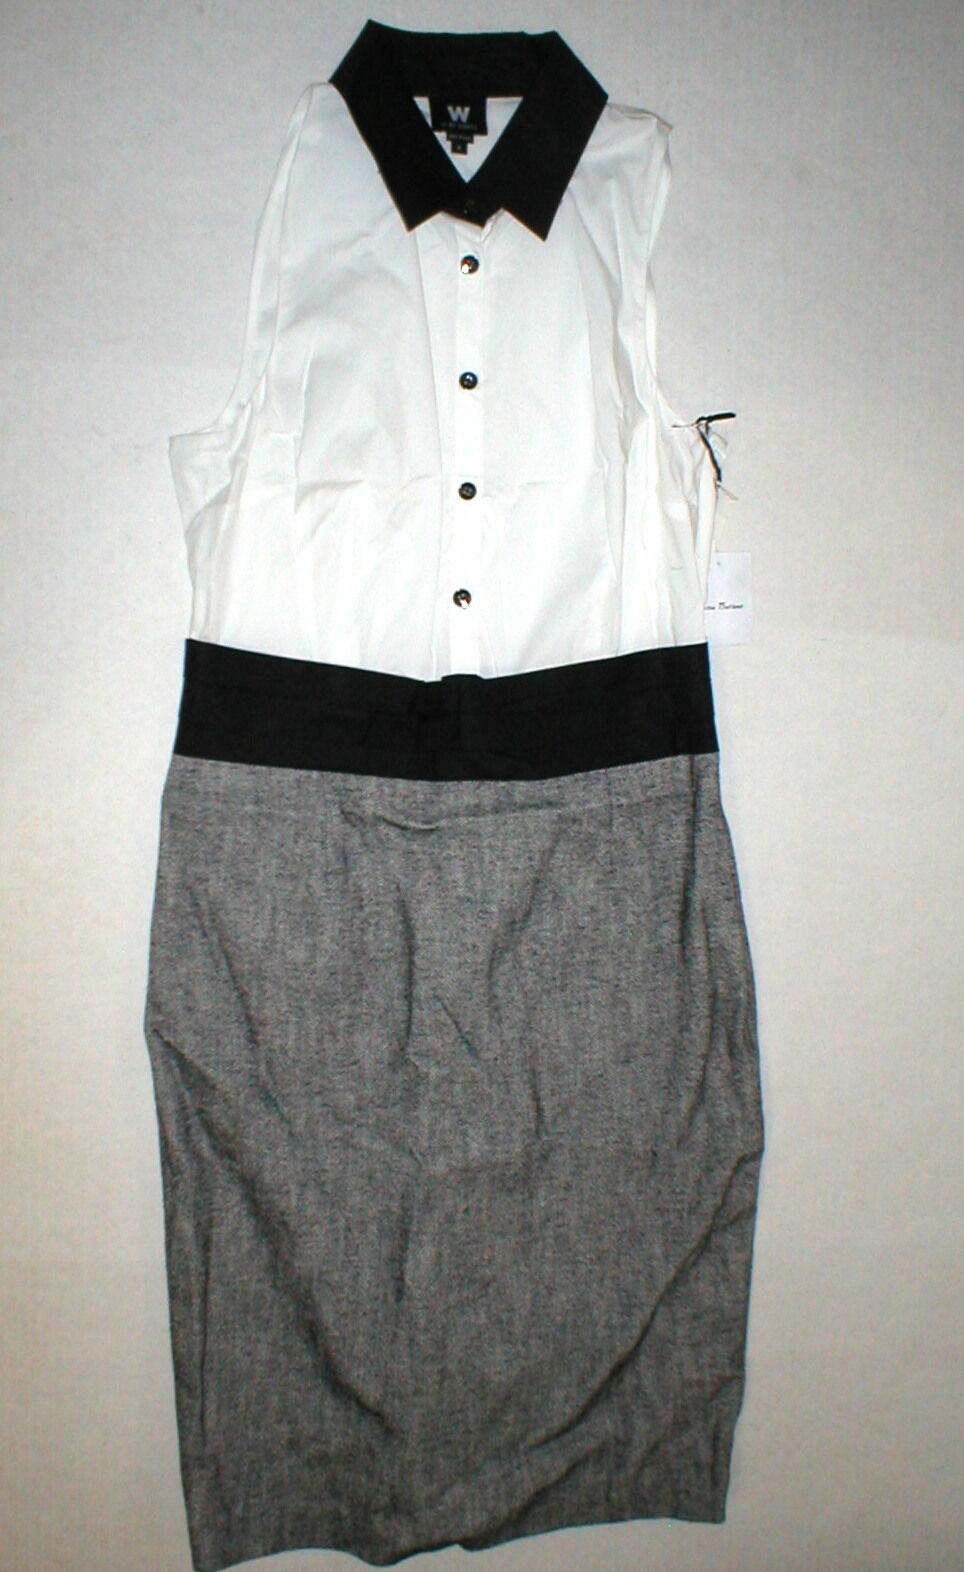 damen NWT  Worth New York 8 Dress schwarz Weiß Gunmetal Farbeblock Office